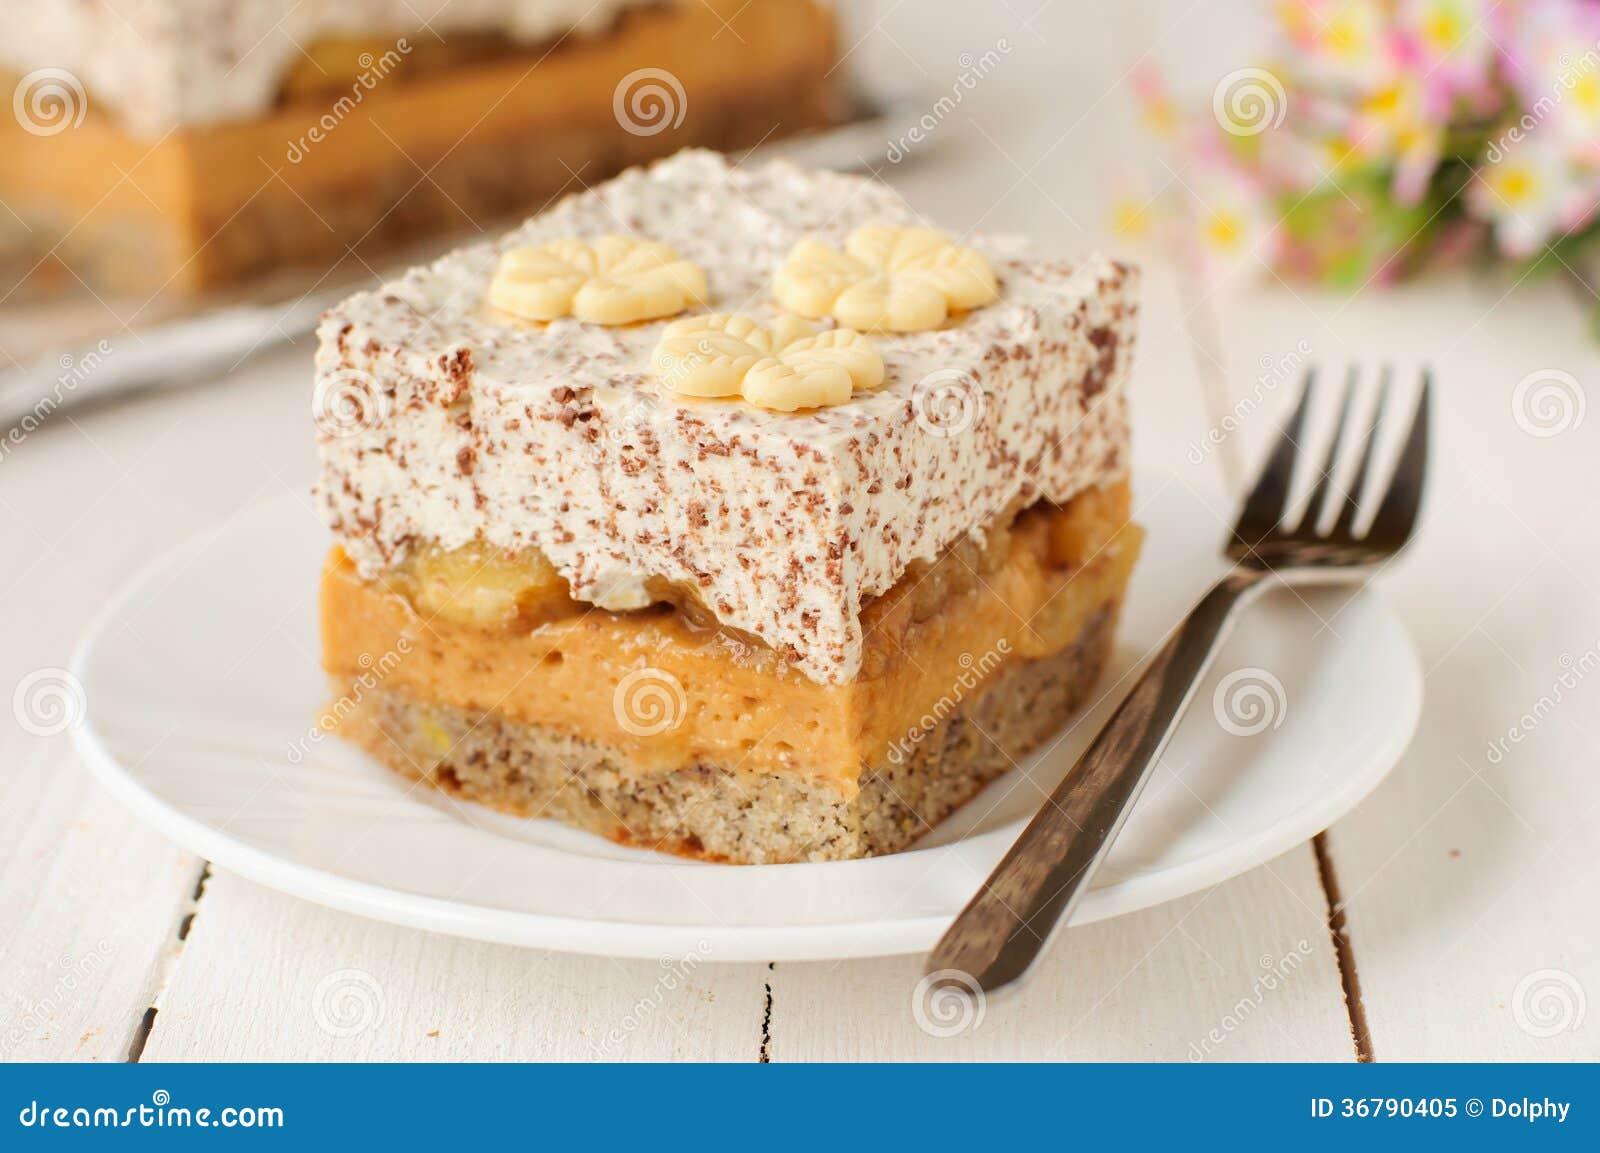 ... Photo: Caramel Custard, Banana and Chocolate Whipped Cream Layer Cake